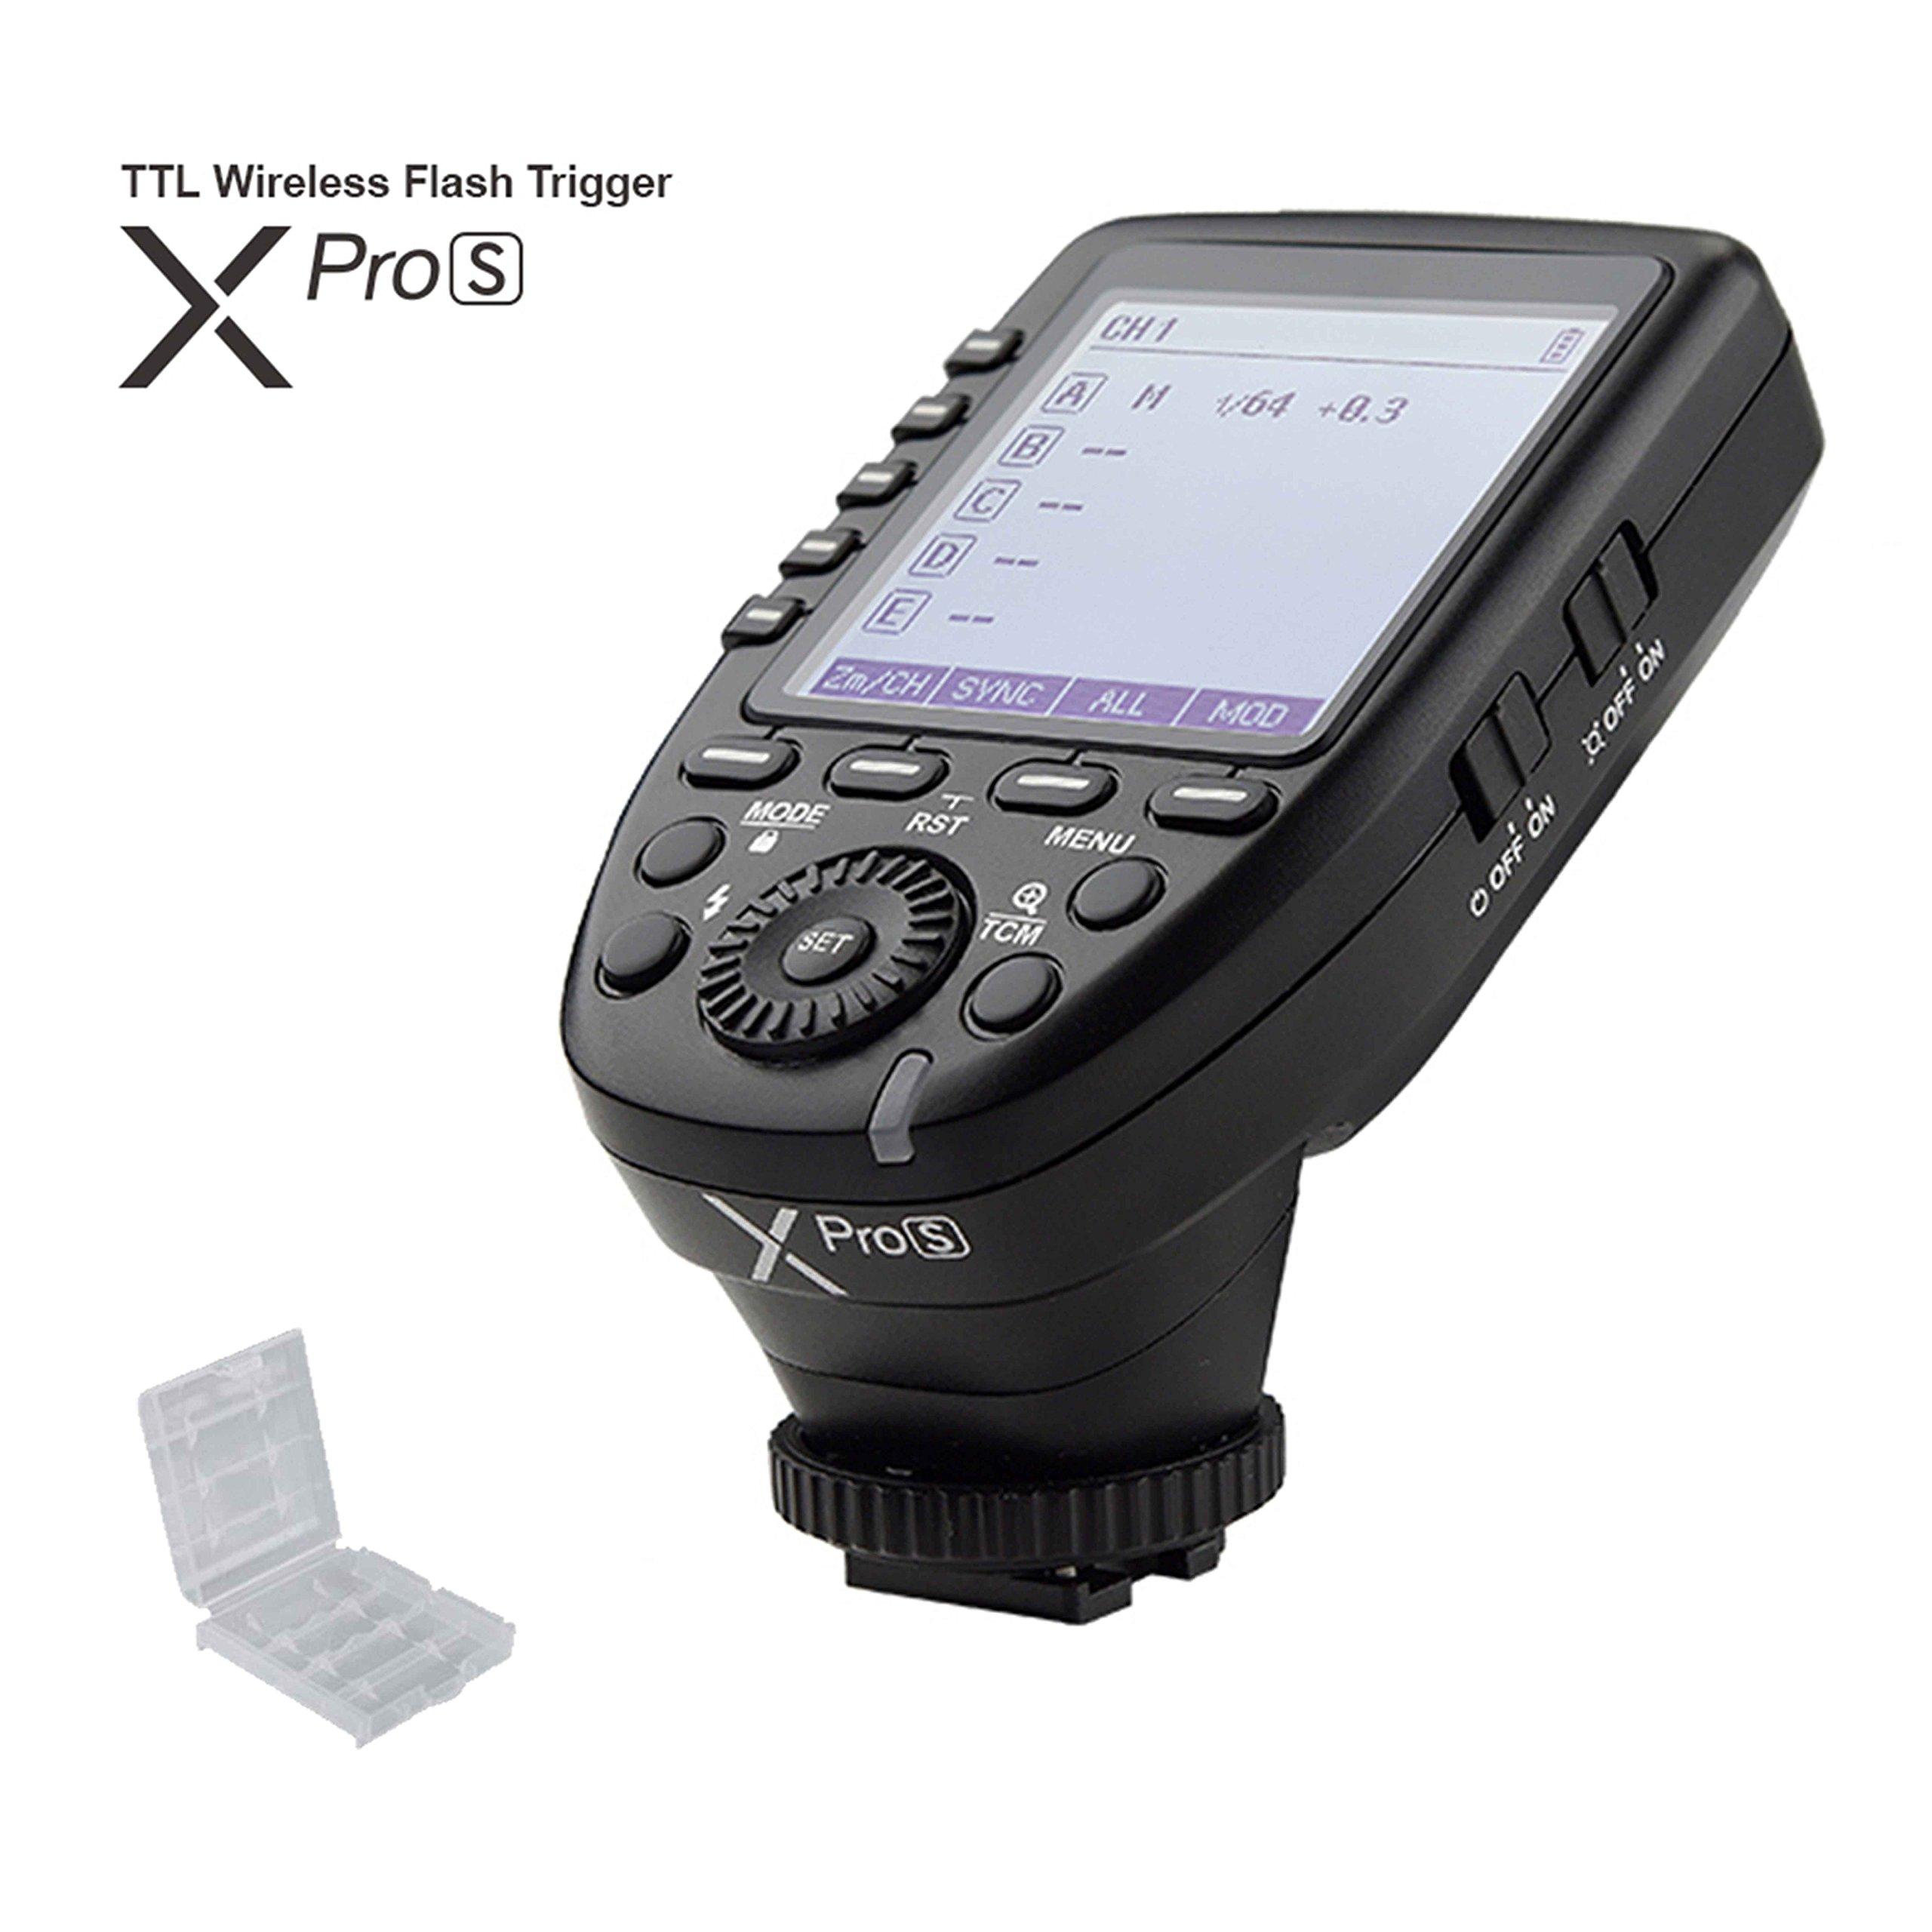 Godox xpro Xpro-S XPros TTL Wireless Flash Trigger 1/8000s 11 Customizable Functions for Sony Camera for Godox TT685S TT350S V860II-S